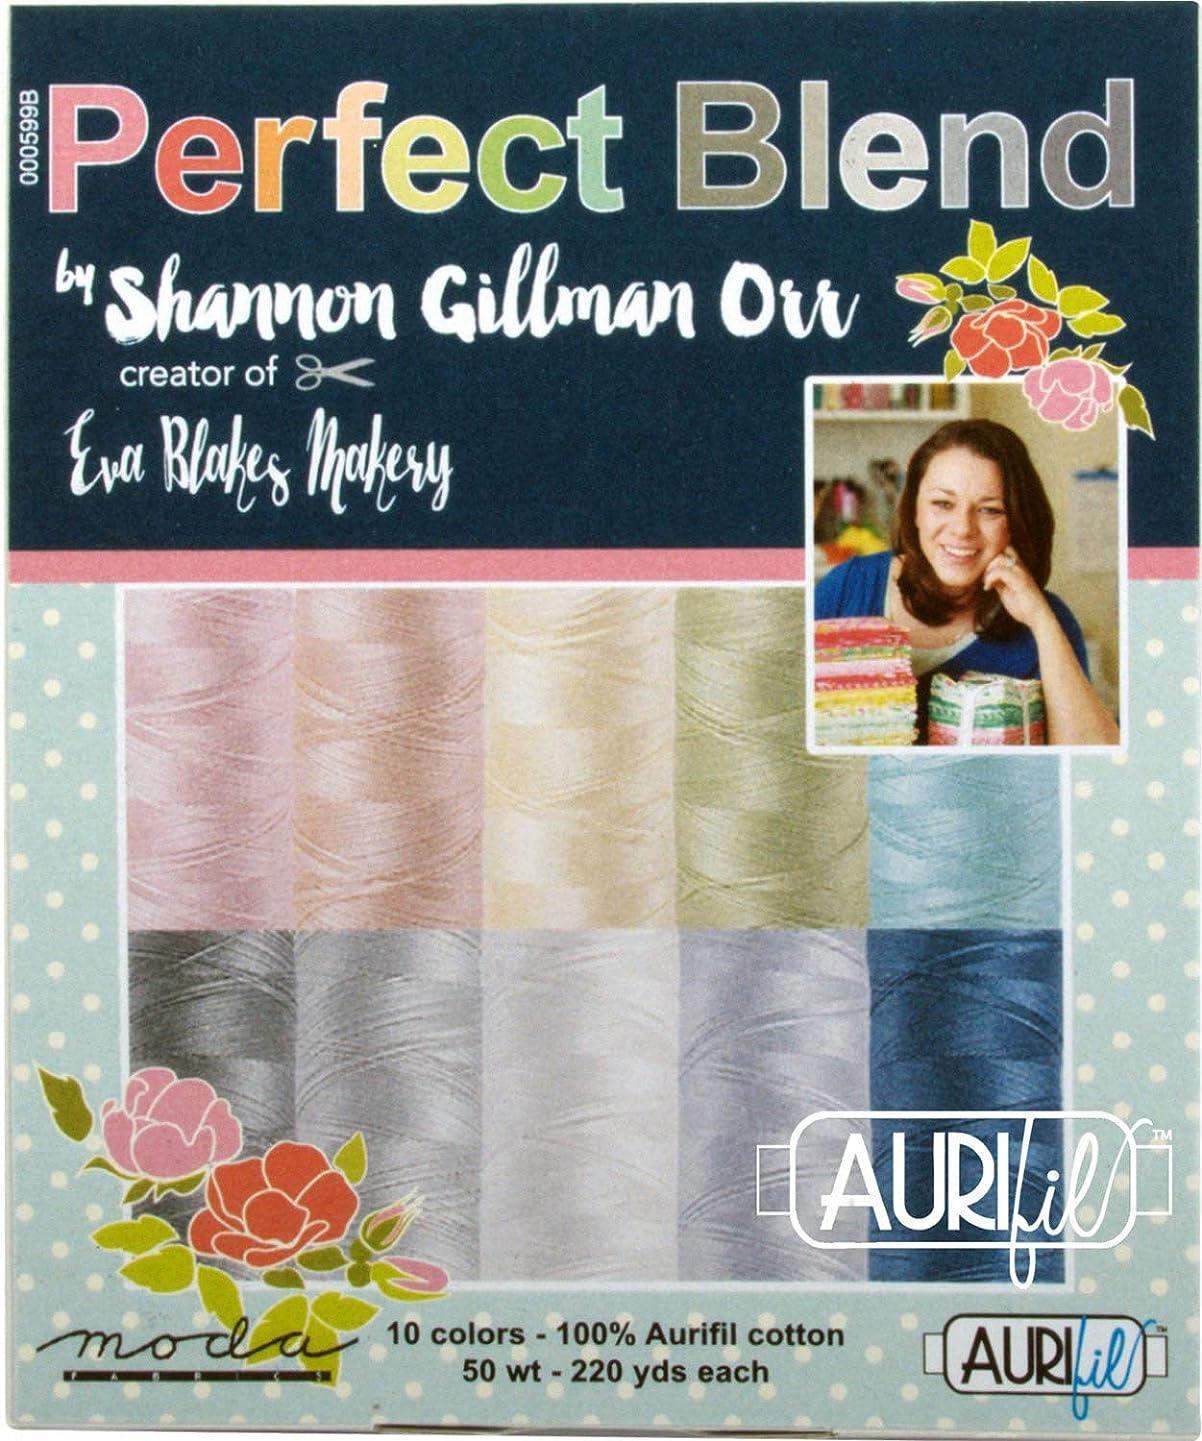 Shannon Gillman Orr Perfect Blend Aurifil Thread Kit 10 Small Spools 50 Weight SO50PB10